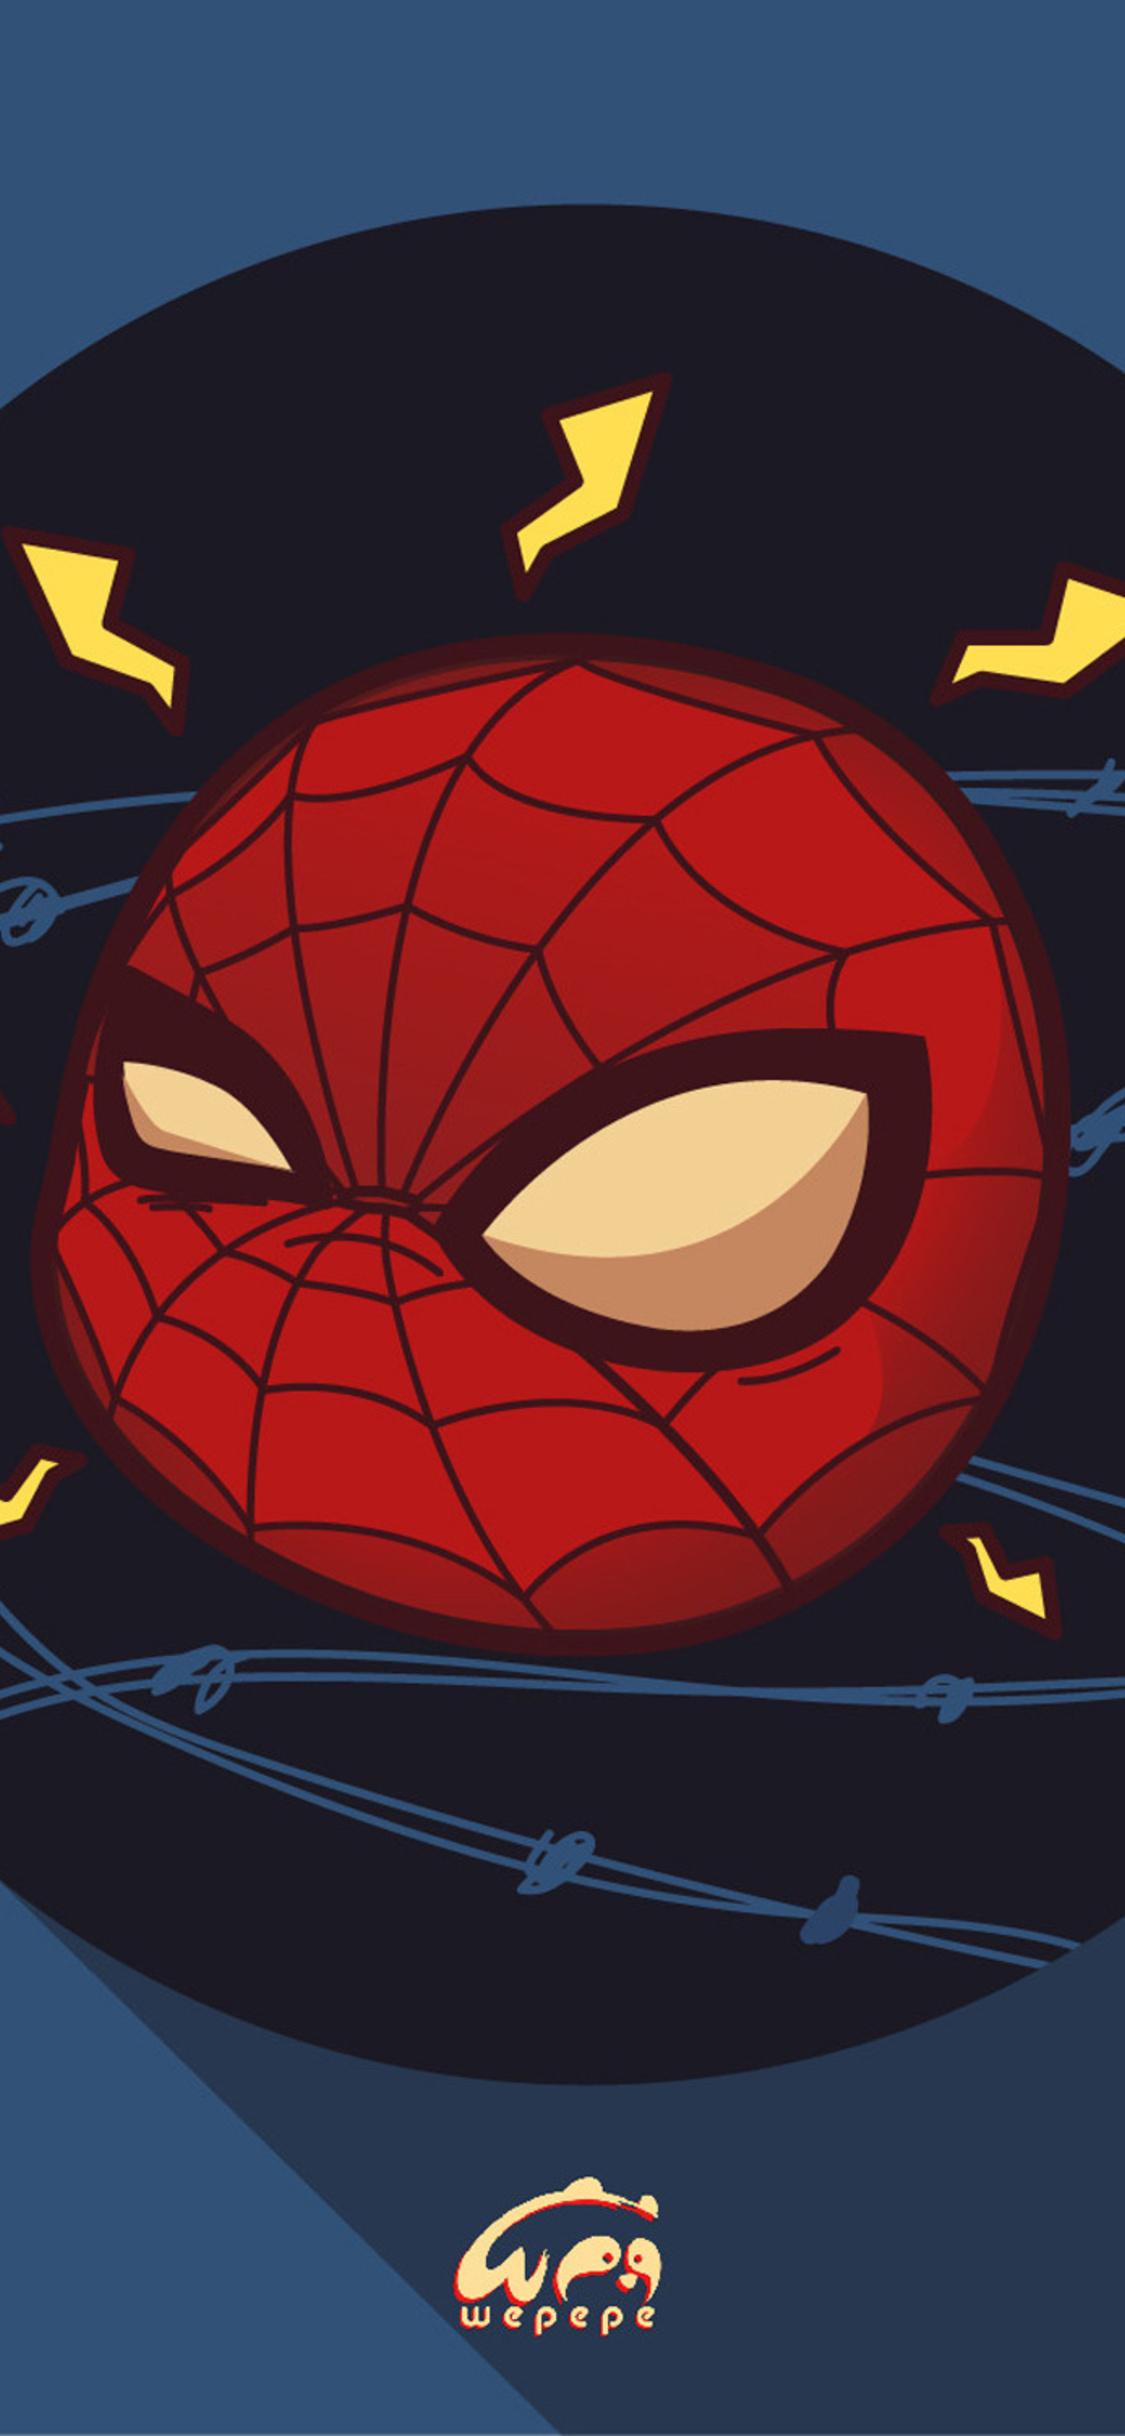 1125x2436 Spiderman Chibi Marvel Heroes